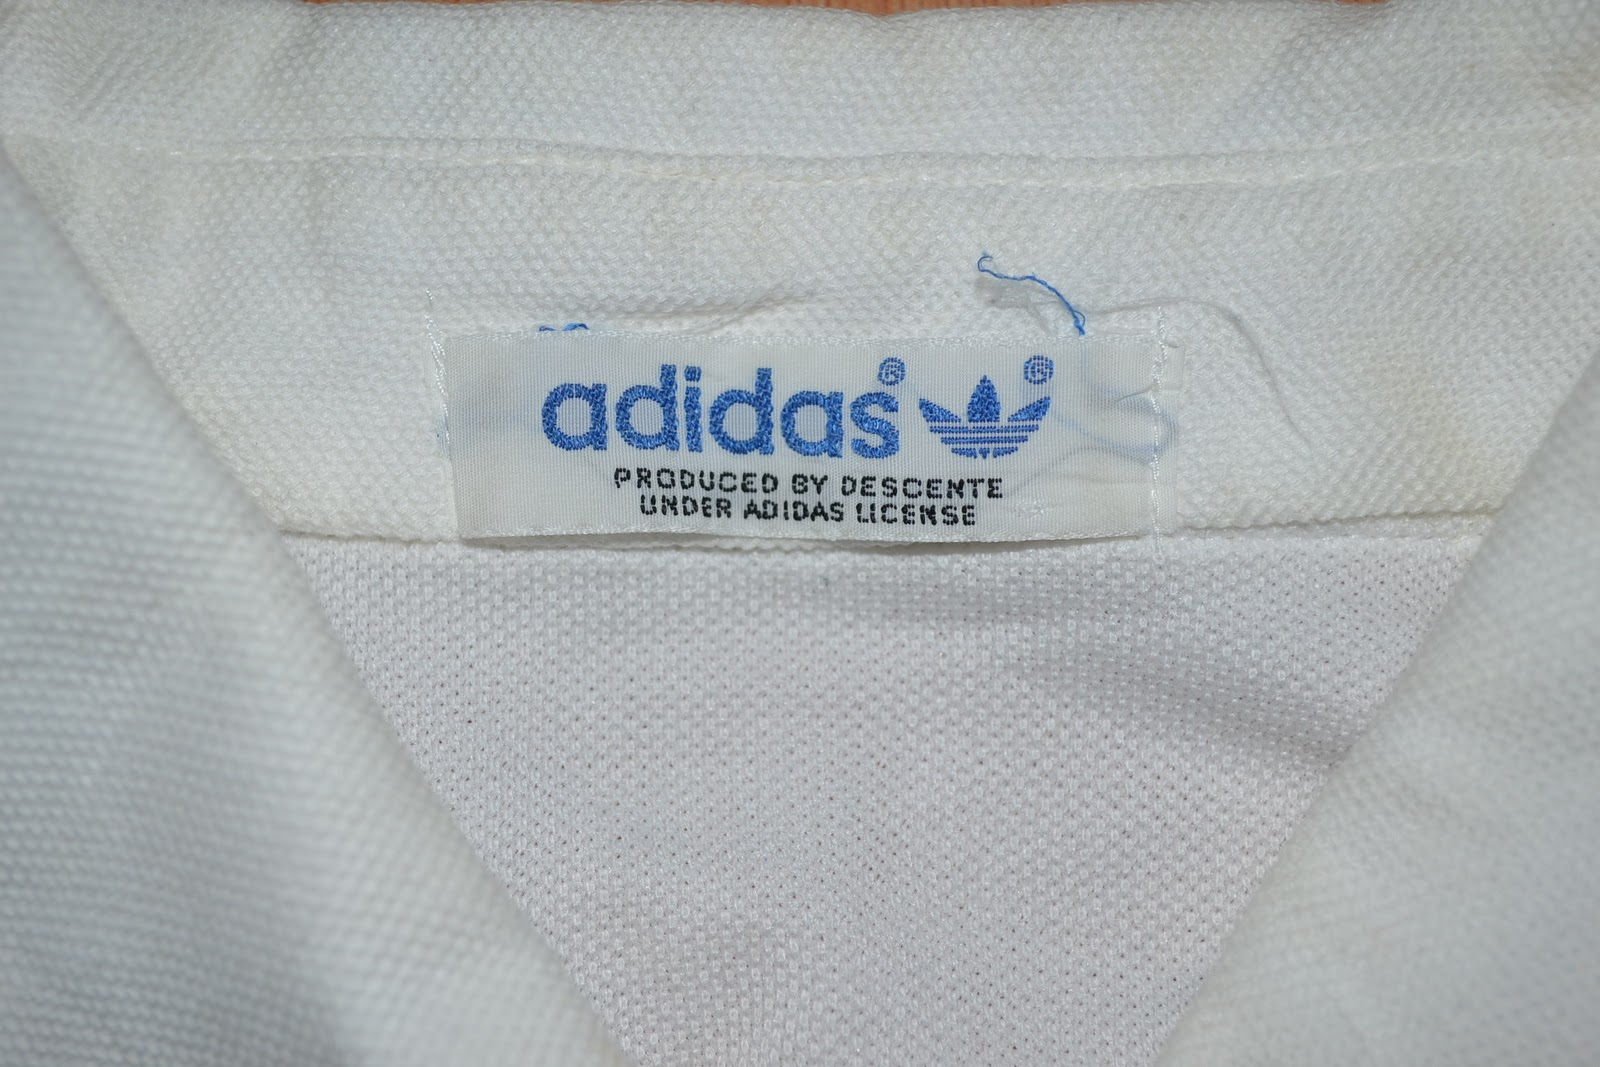 Anak Liar Rocks Vintage Adidas By Descente Polo T Shirt Sold